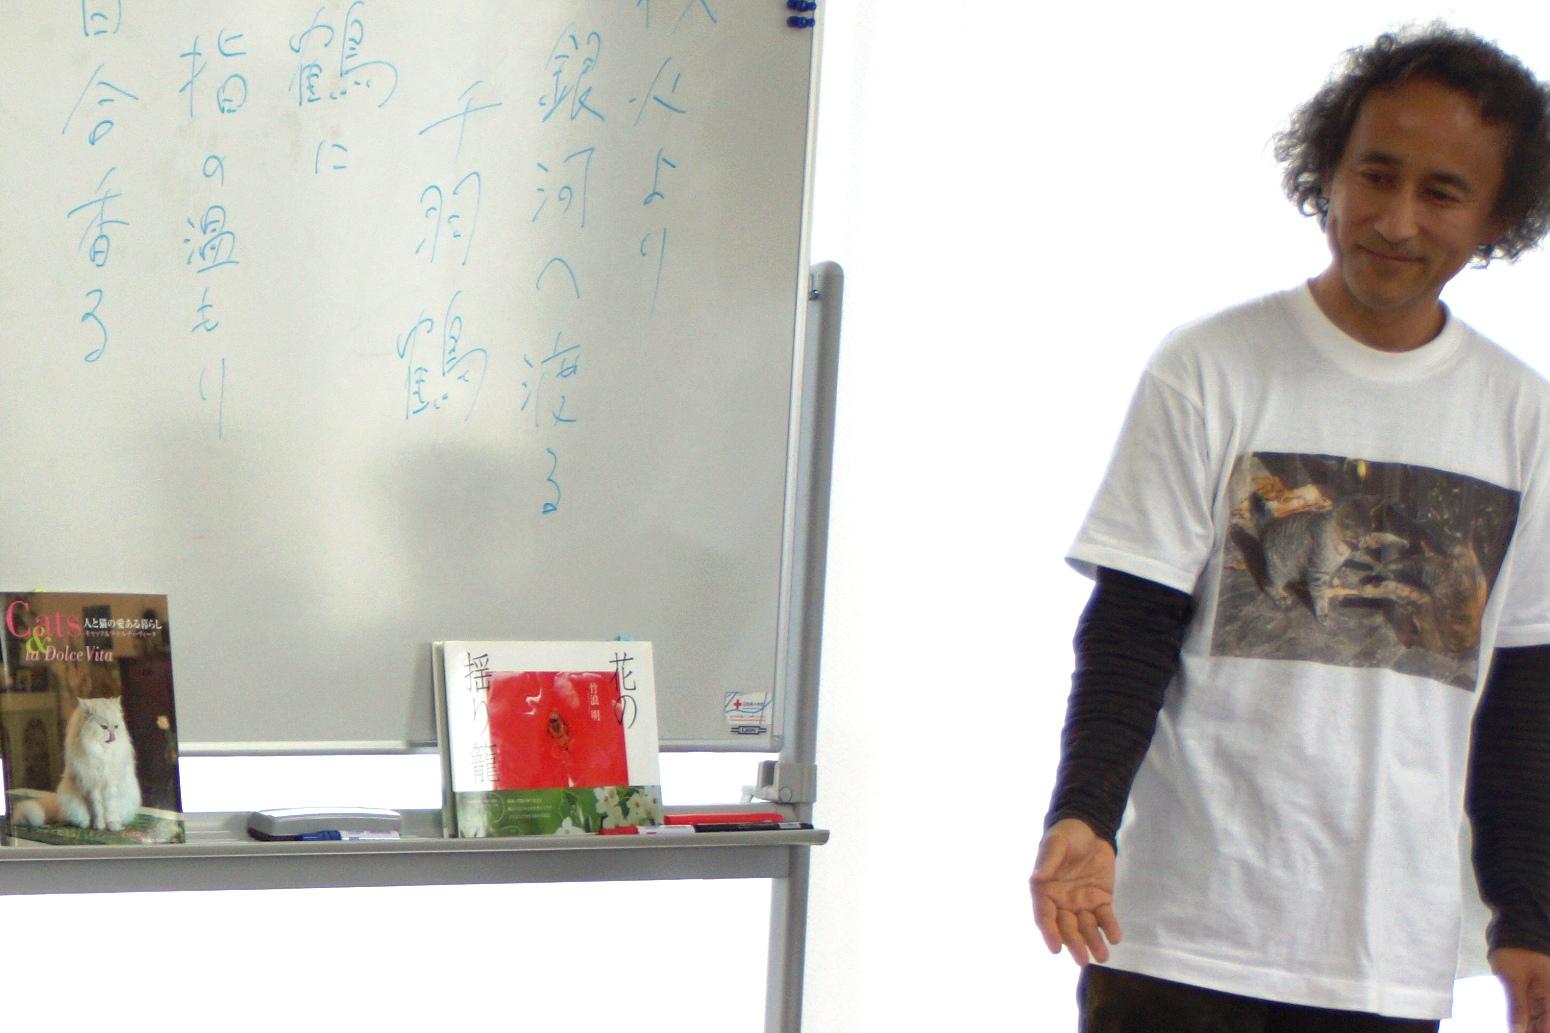 宮城県・福島県の仮設住宅集会所でコンサート~東日本大震災復興支援Tネット販売開始~今日月曜6人展初日_f0006713_944435.jpg